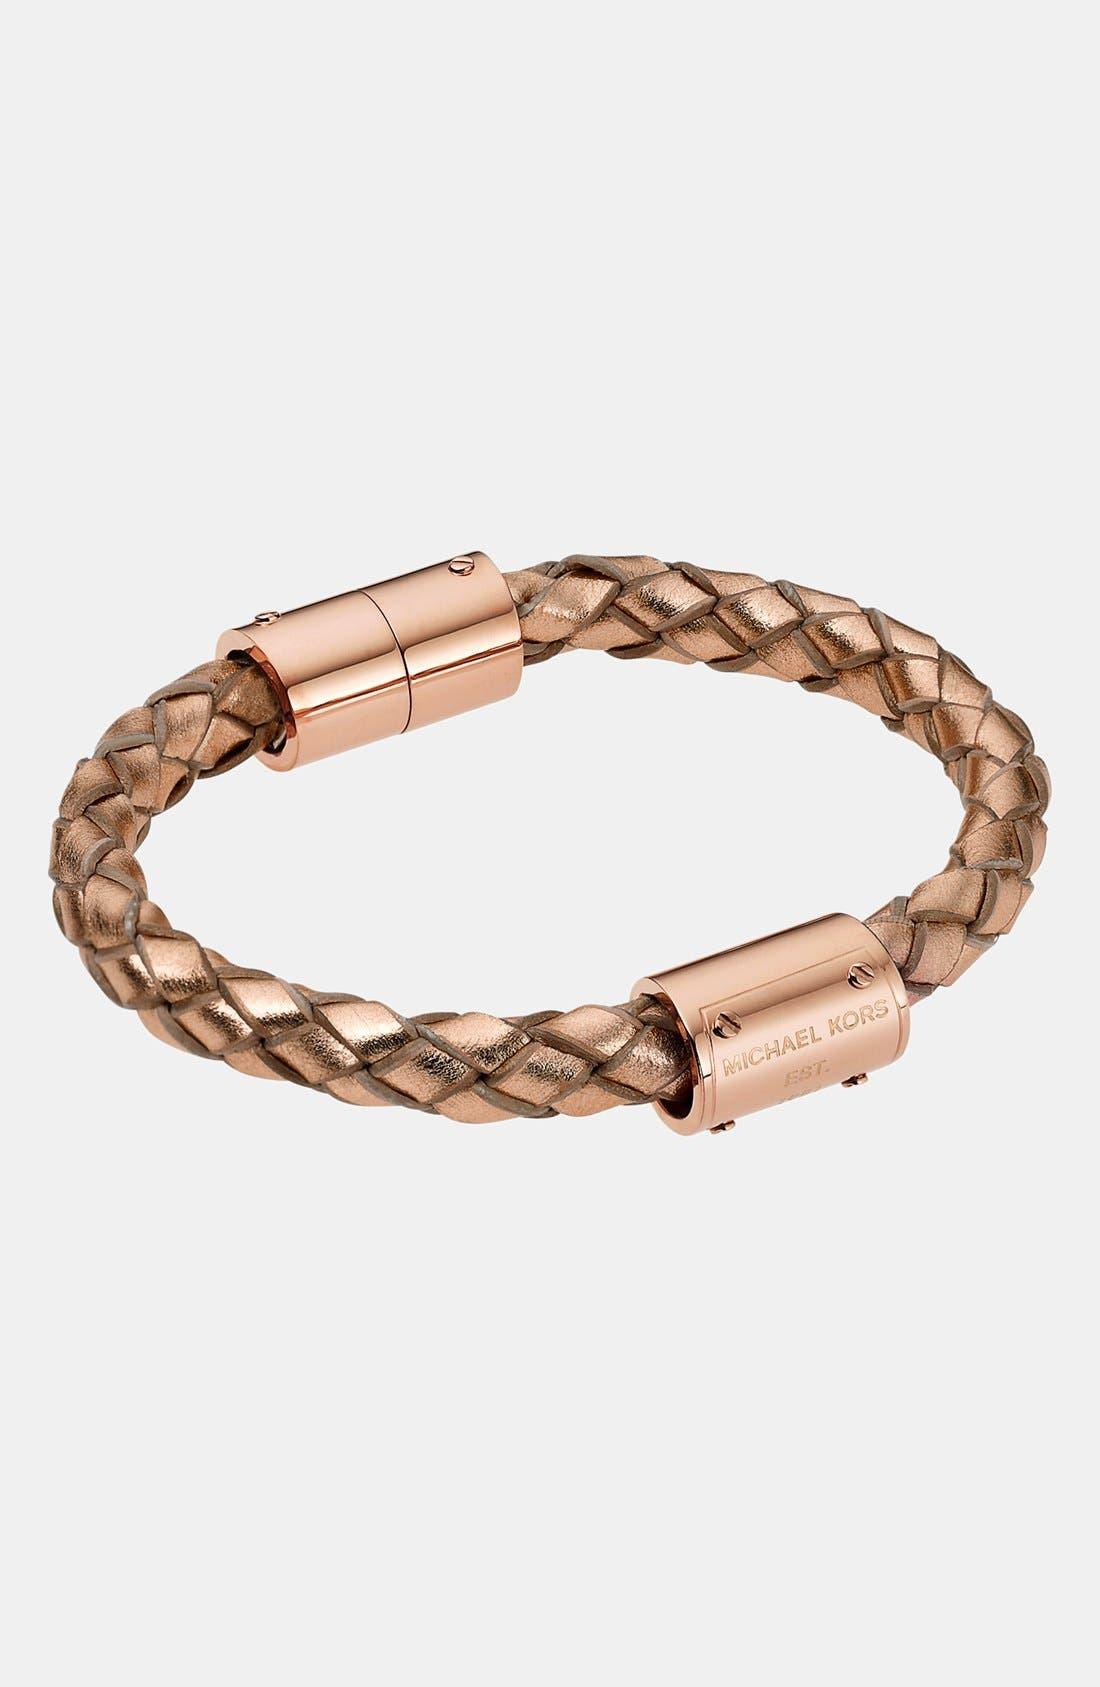 Alternate Image 1 Selected - Michael Kors 'Skorpios' Metallic Leather Rope Bracelet